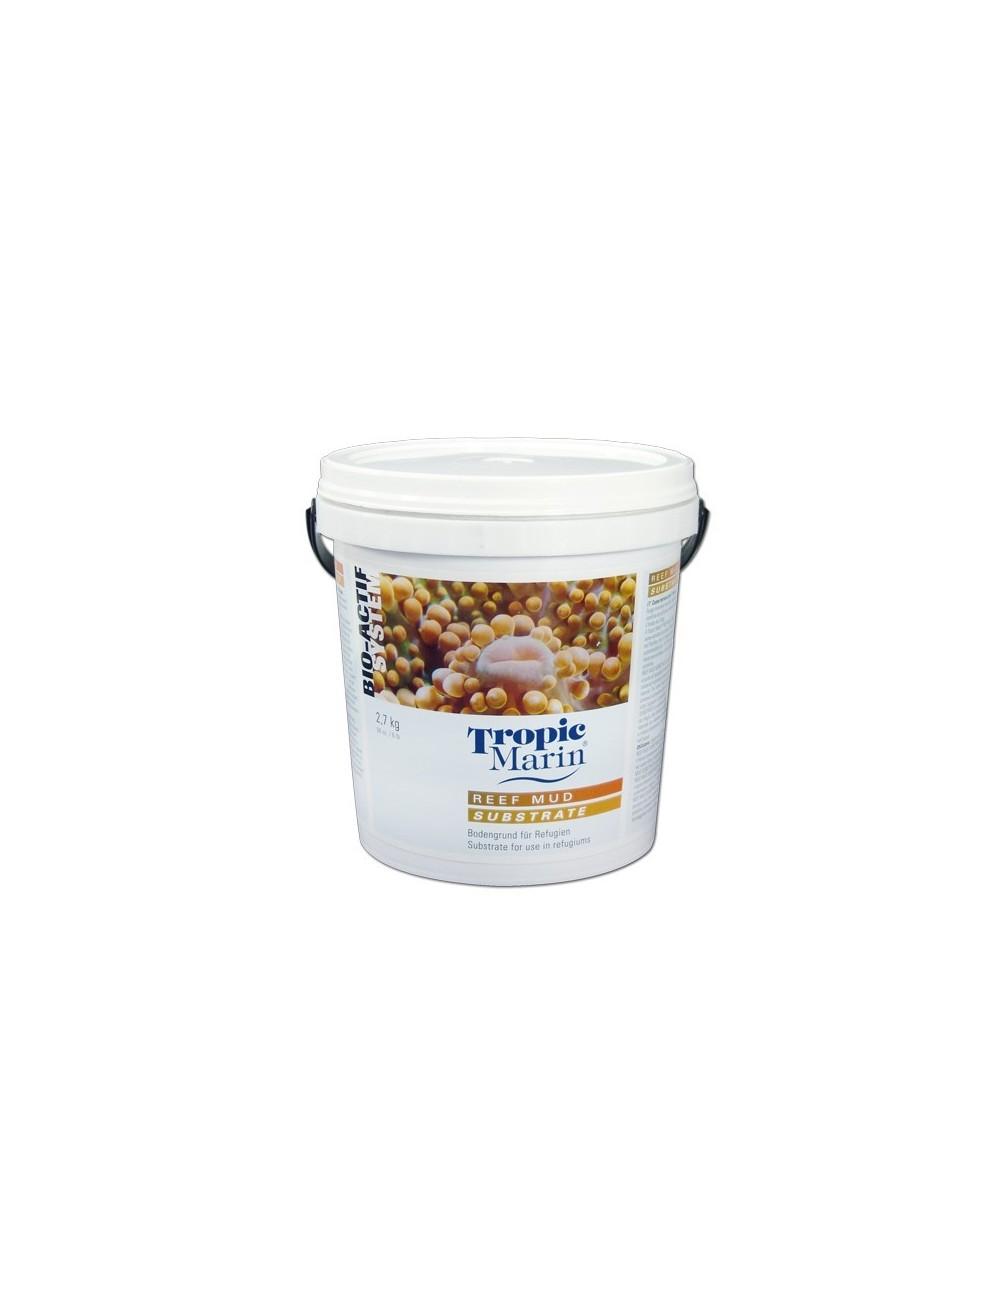 TROPIC MARIN - MUD Substrate 2,7 Kg